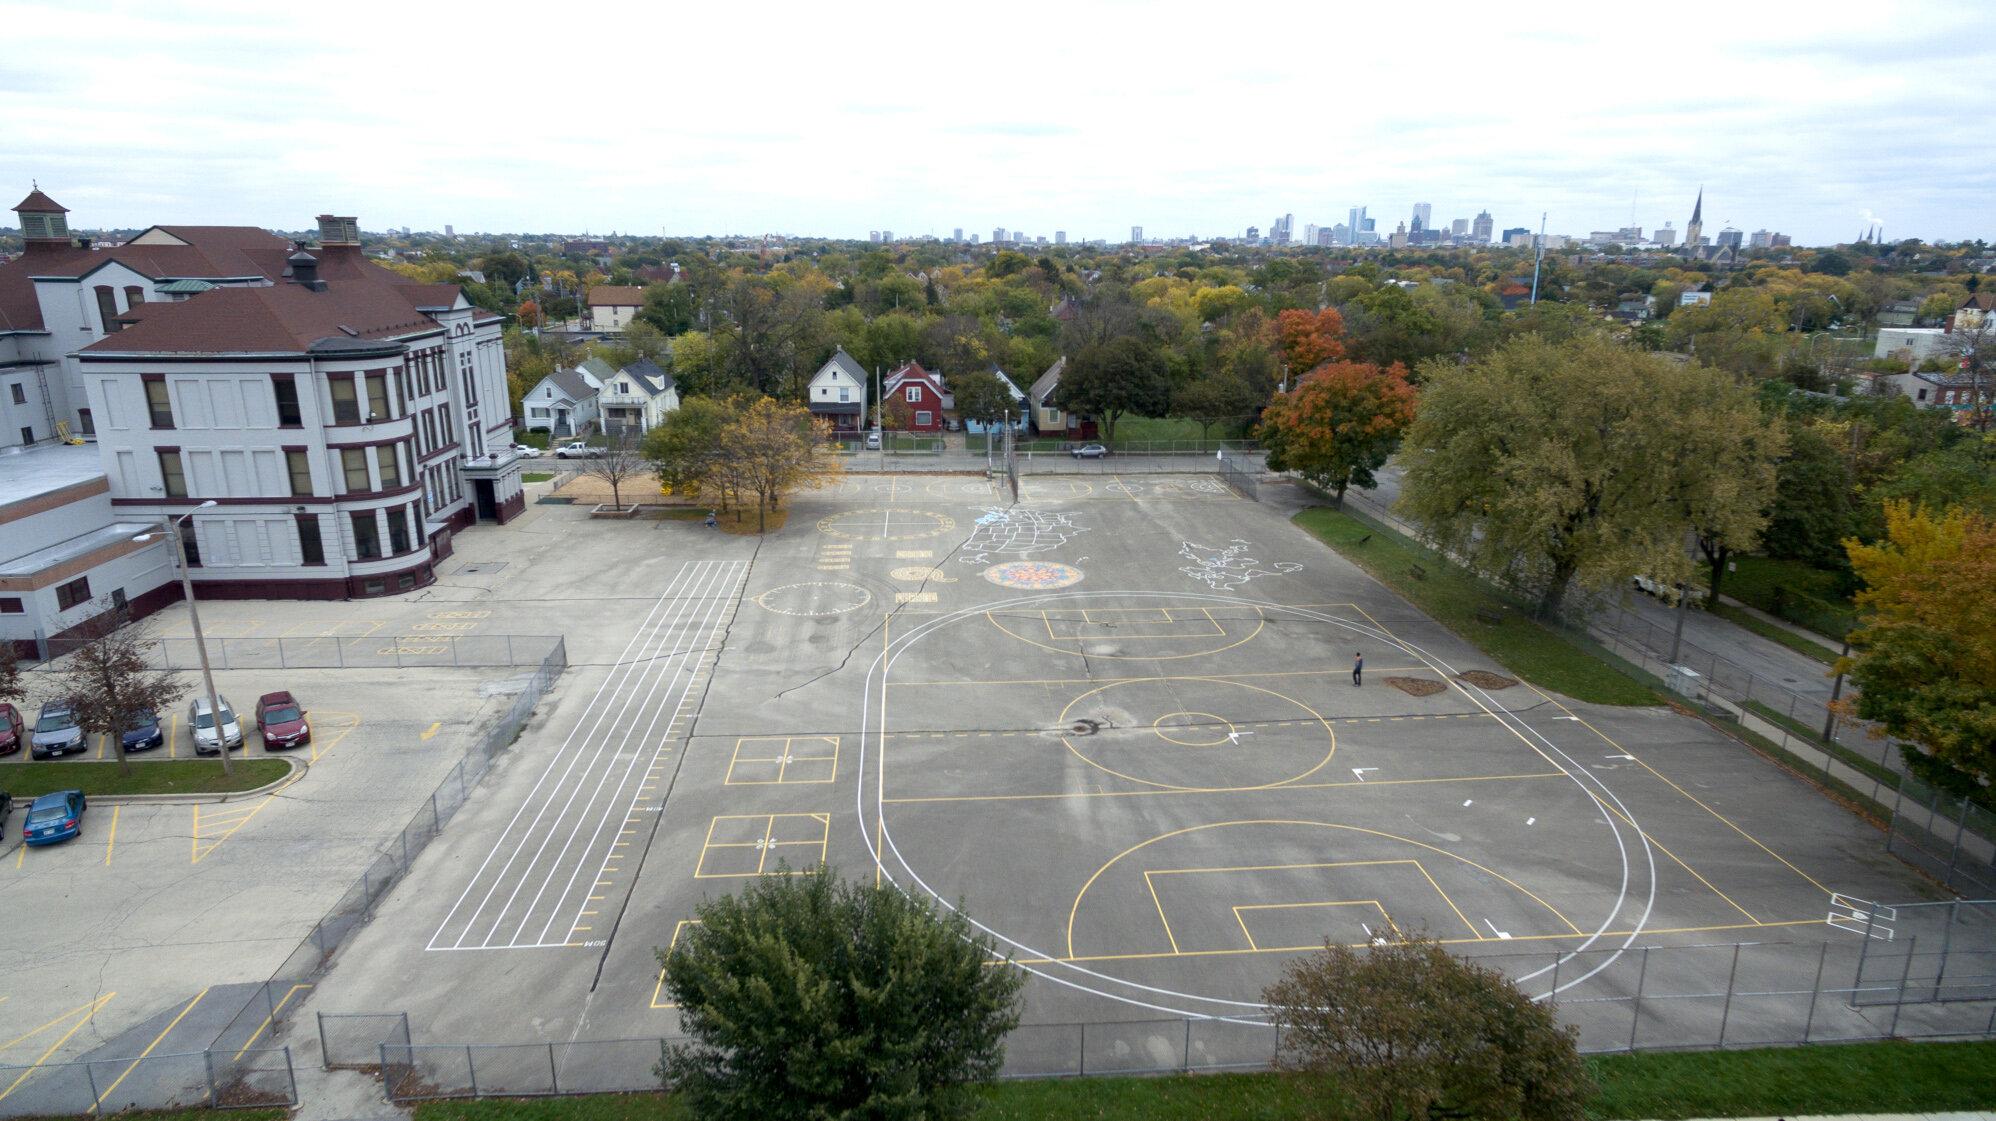 Playground in 2019